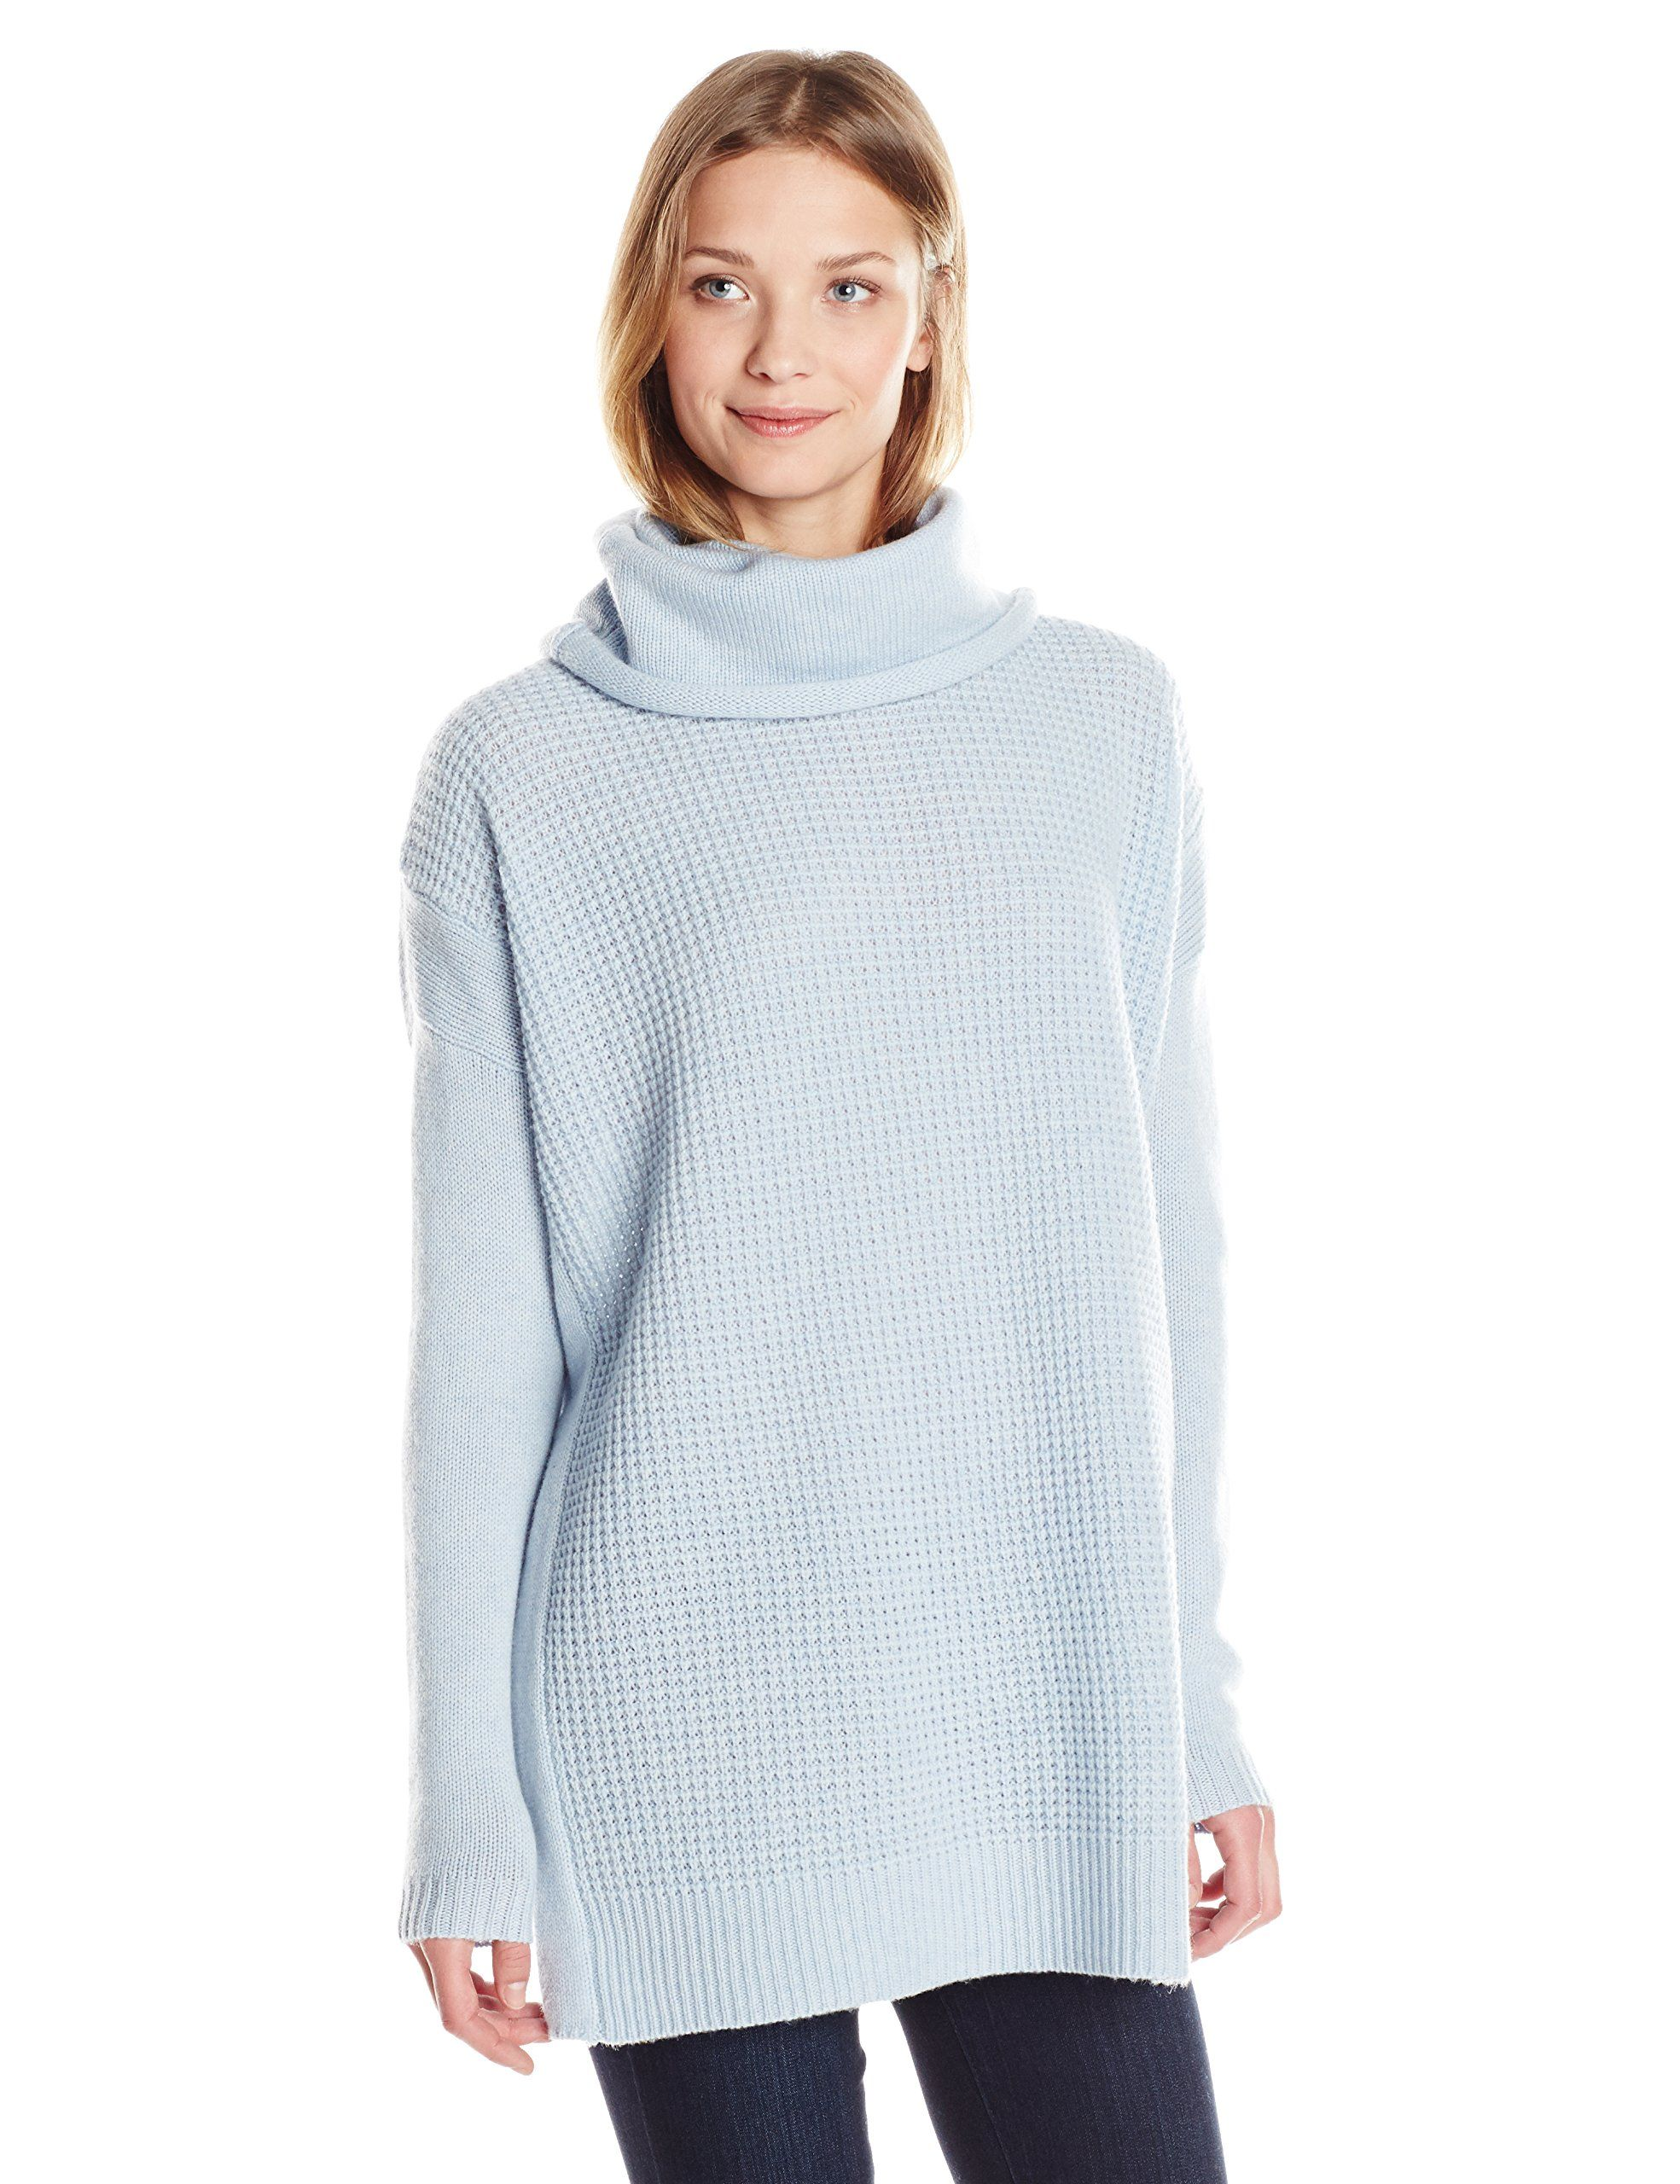 Joan Vass Women's Cowl Neck Tunic Sweater, Artic Blue, 1 | Closet ...